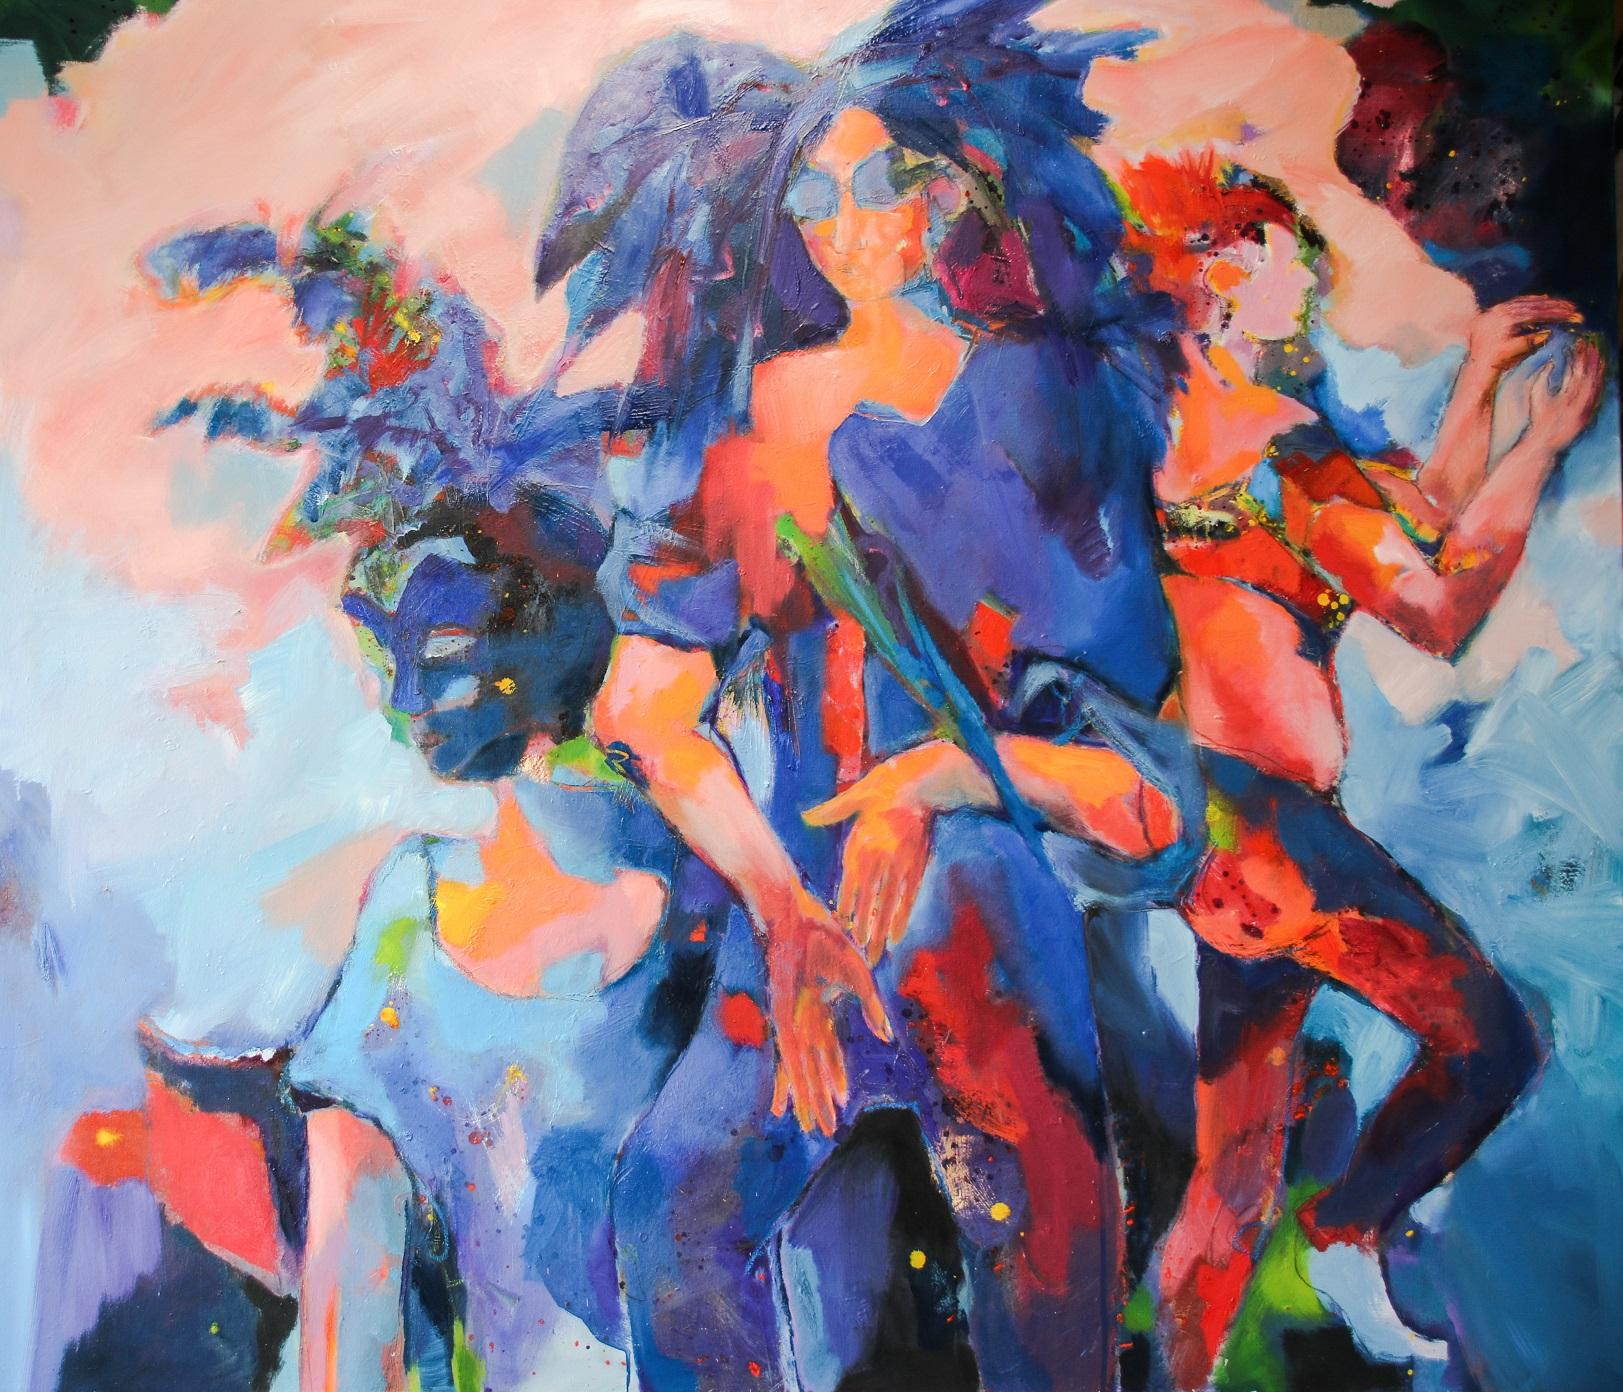 Karneval, 2019, Öl auf Leinwand, 120 x 140 cm